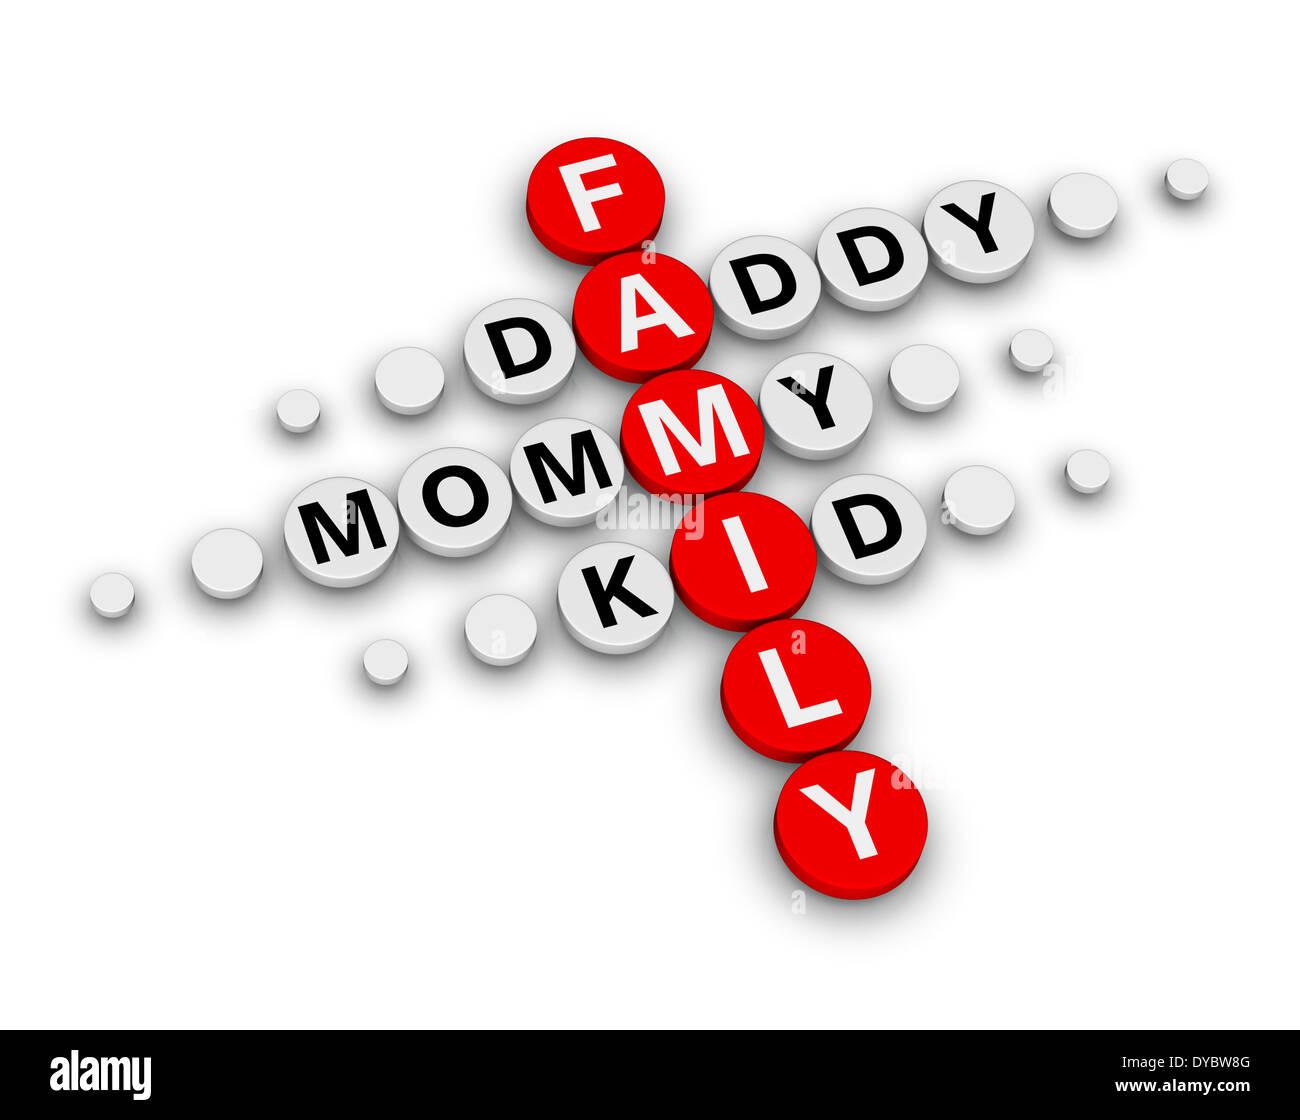 Crossword Kid Stock Photos & Crossword Kid Stock Images - Alamy